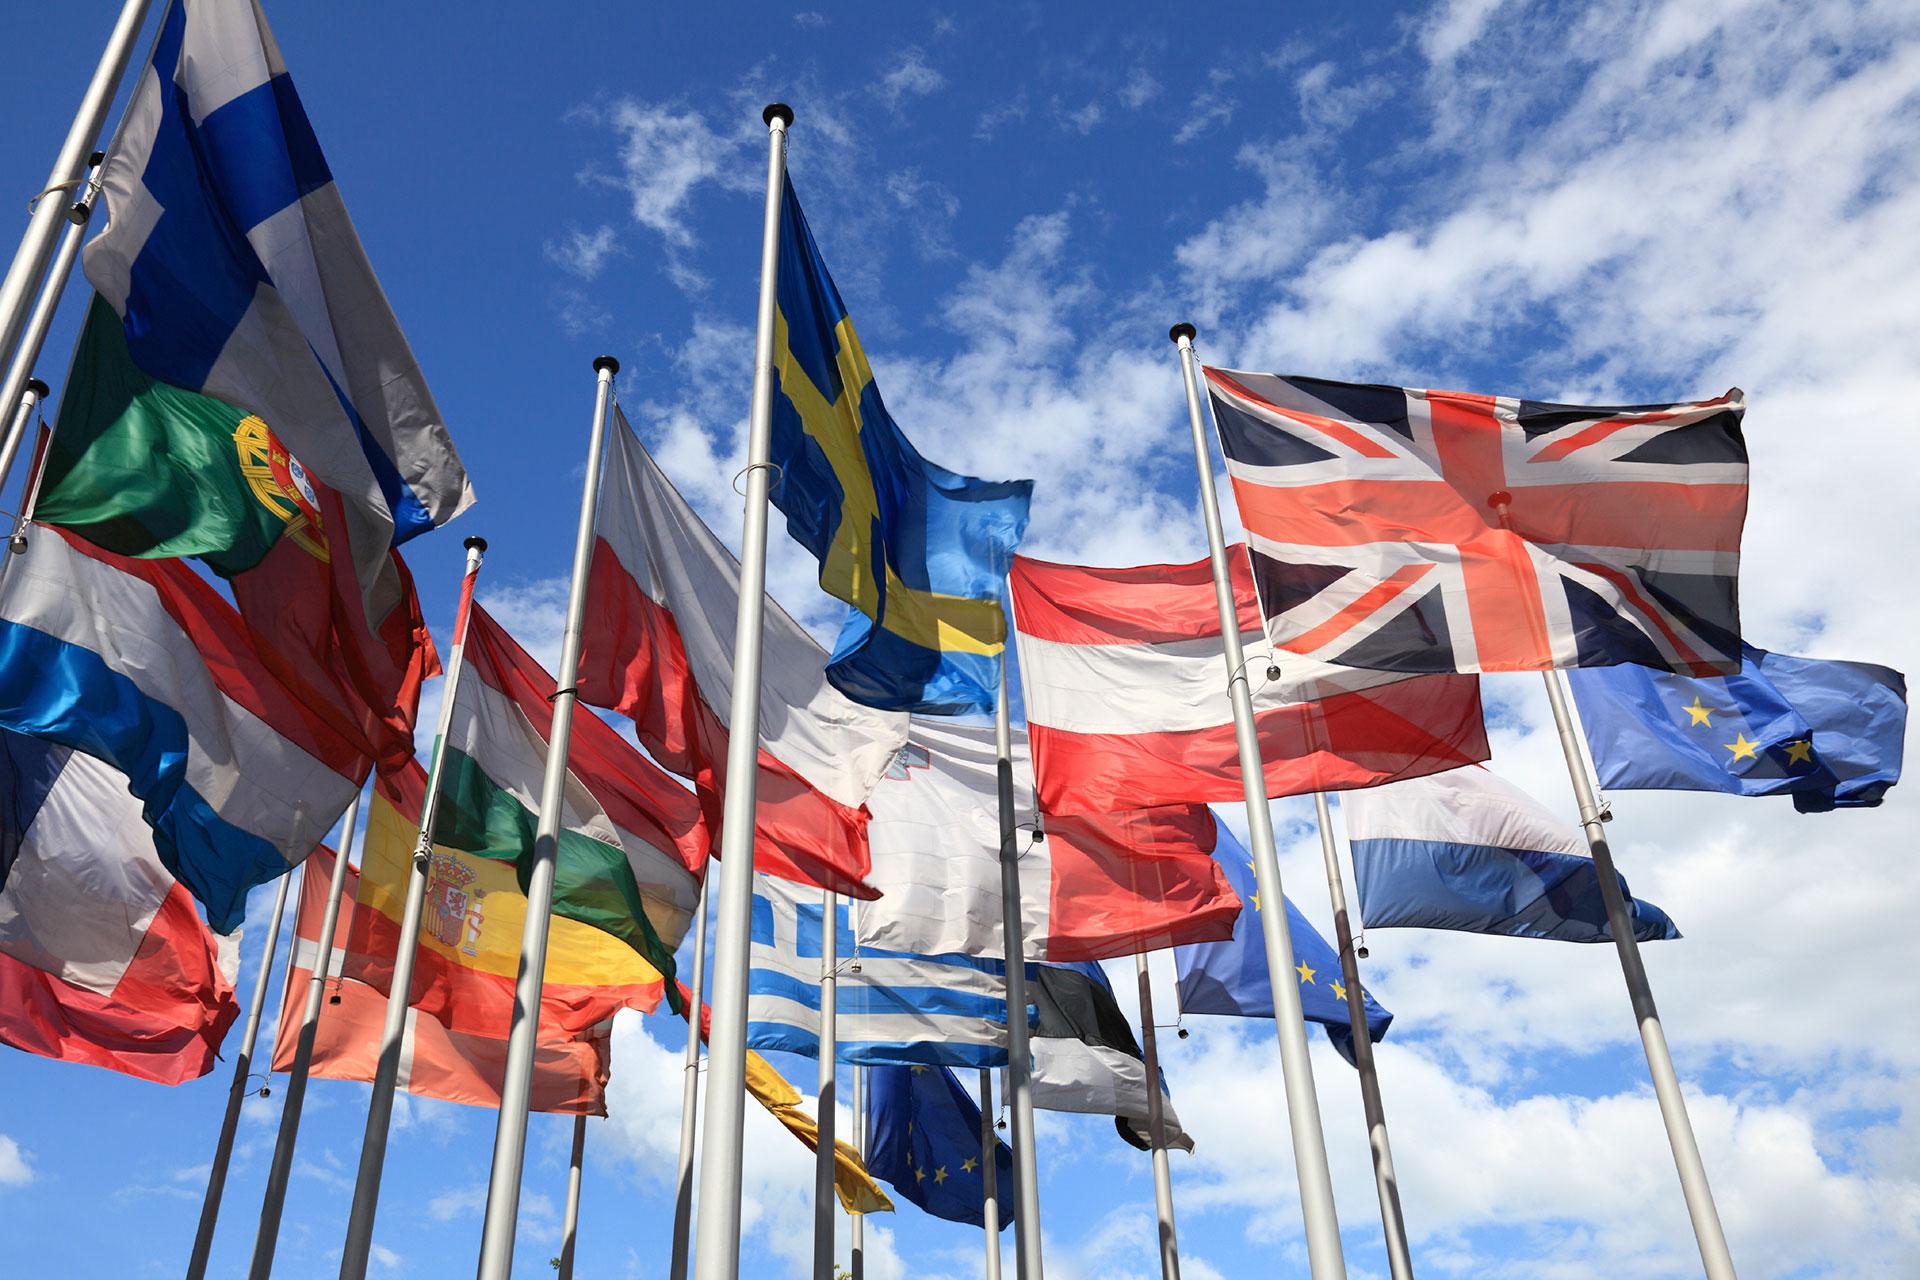 european flags in wind 000011998719 1920x1080